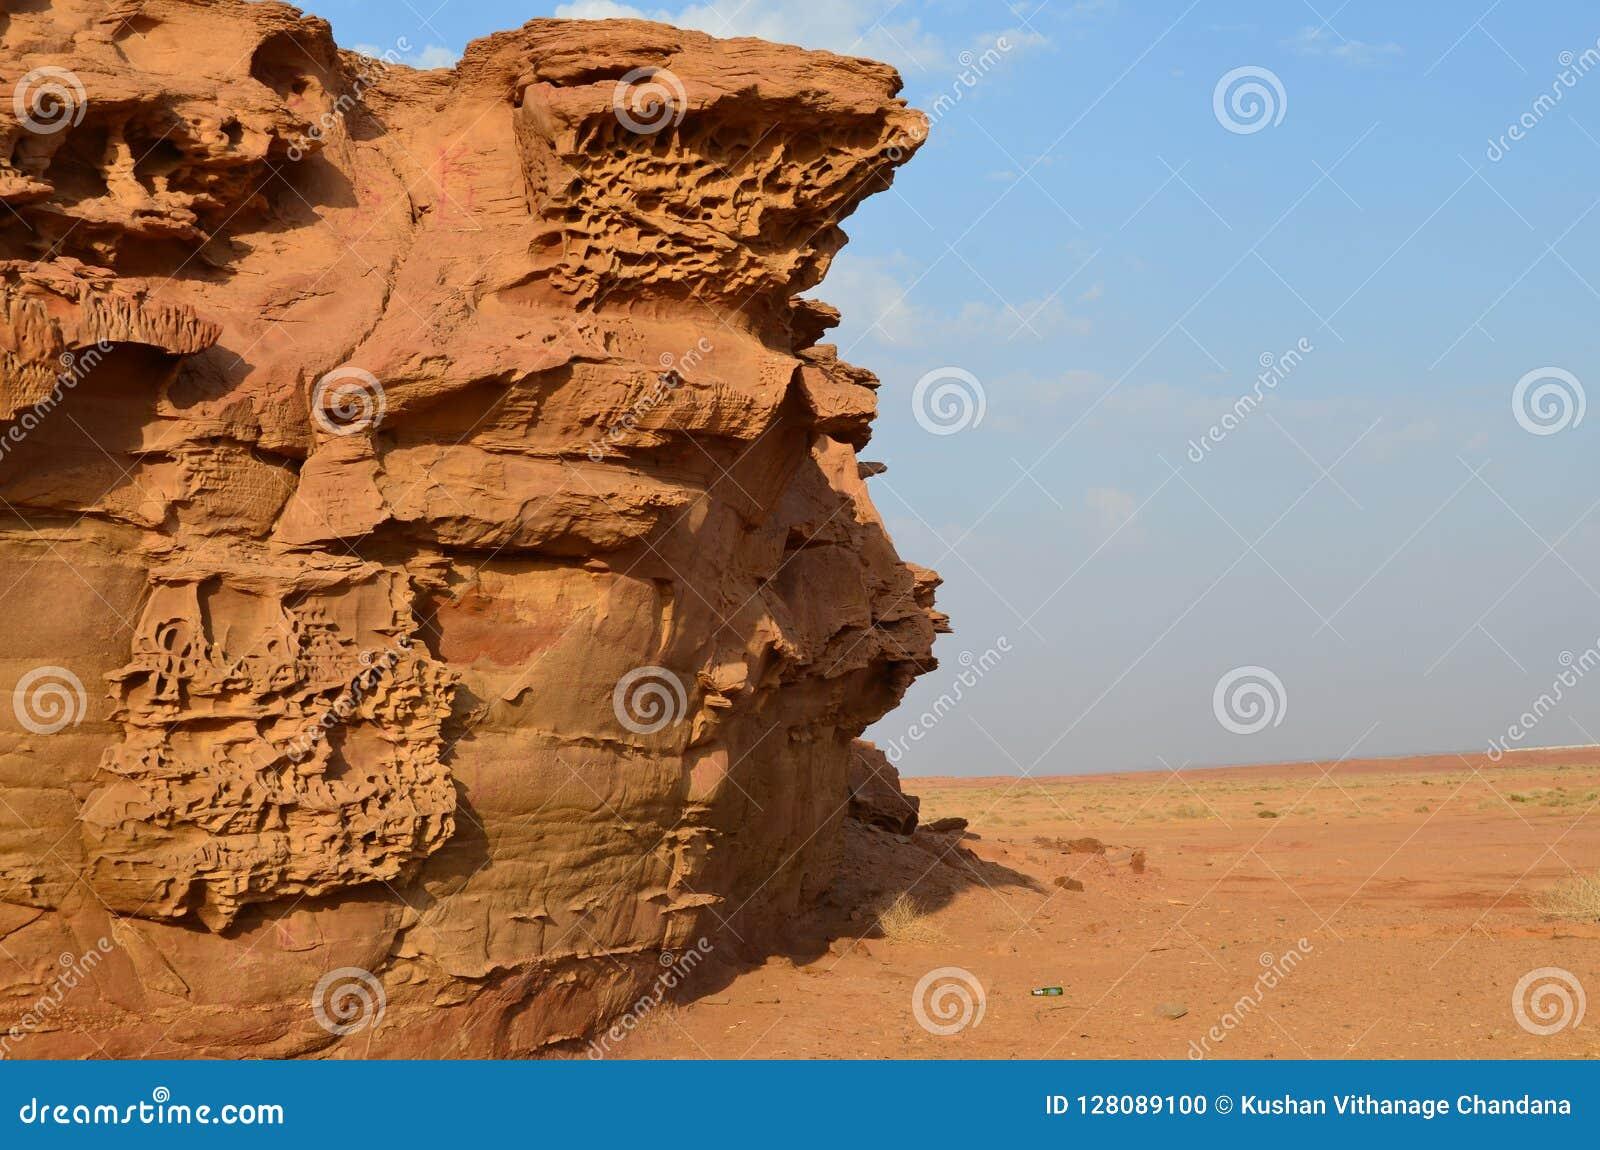 Beautiful creation of the nature in saudi desert.